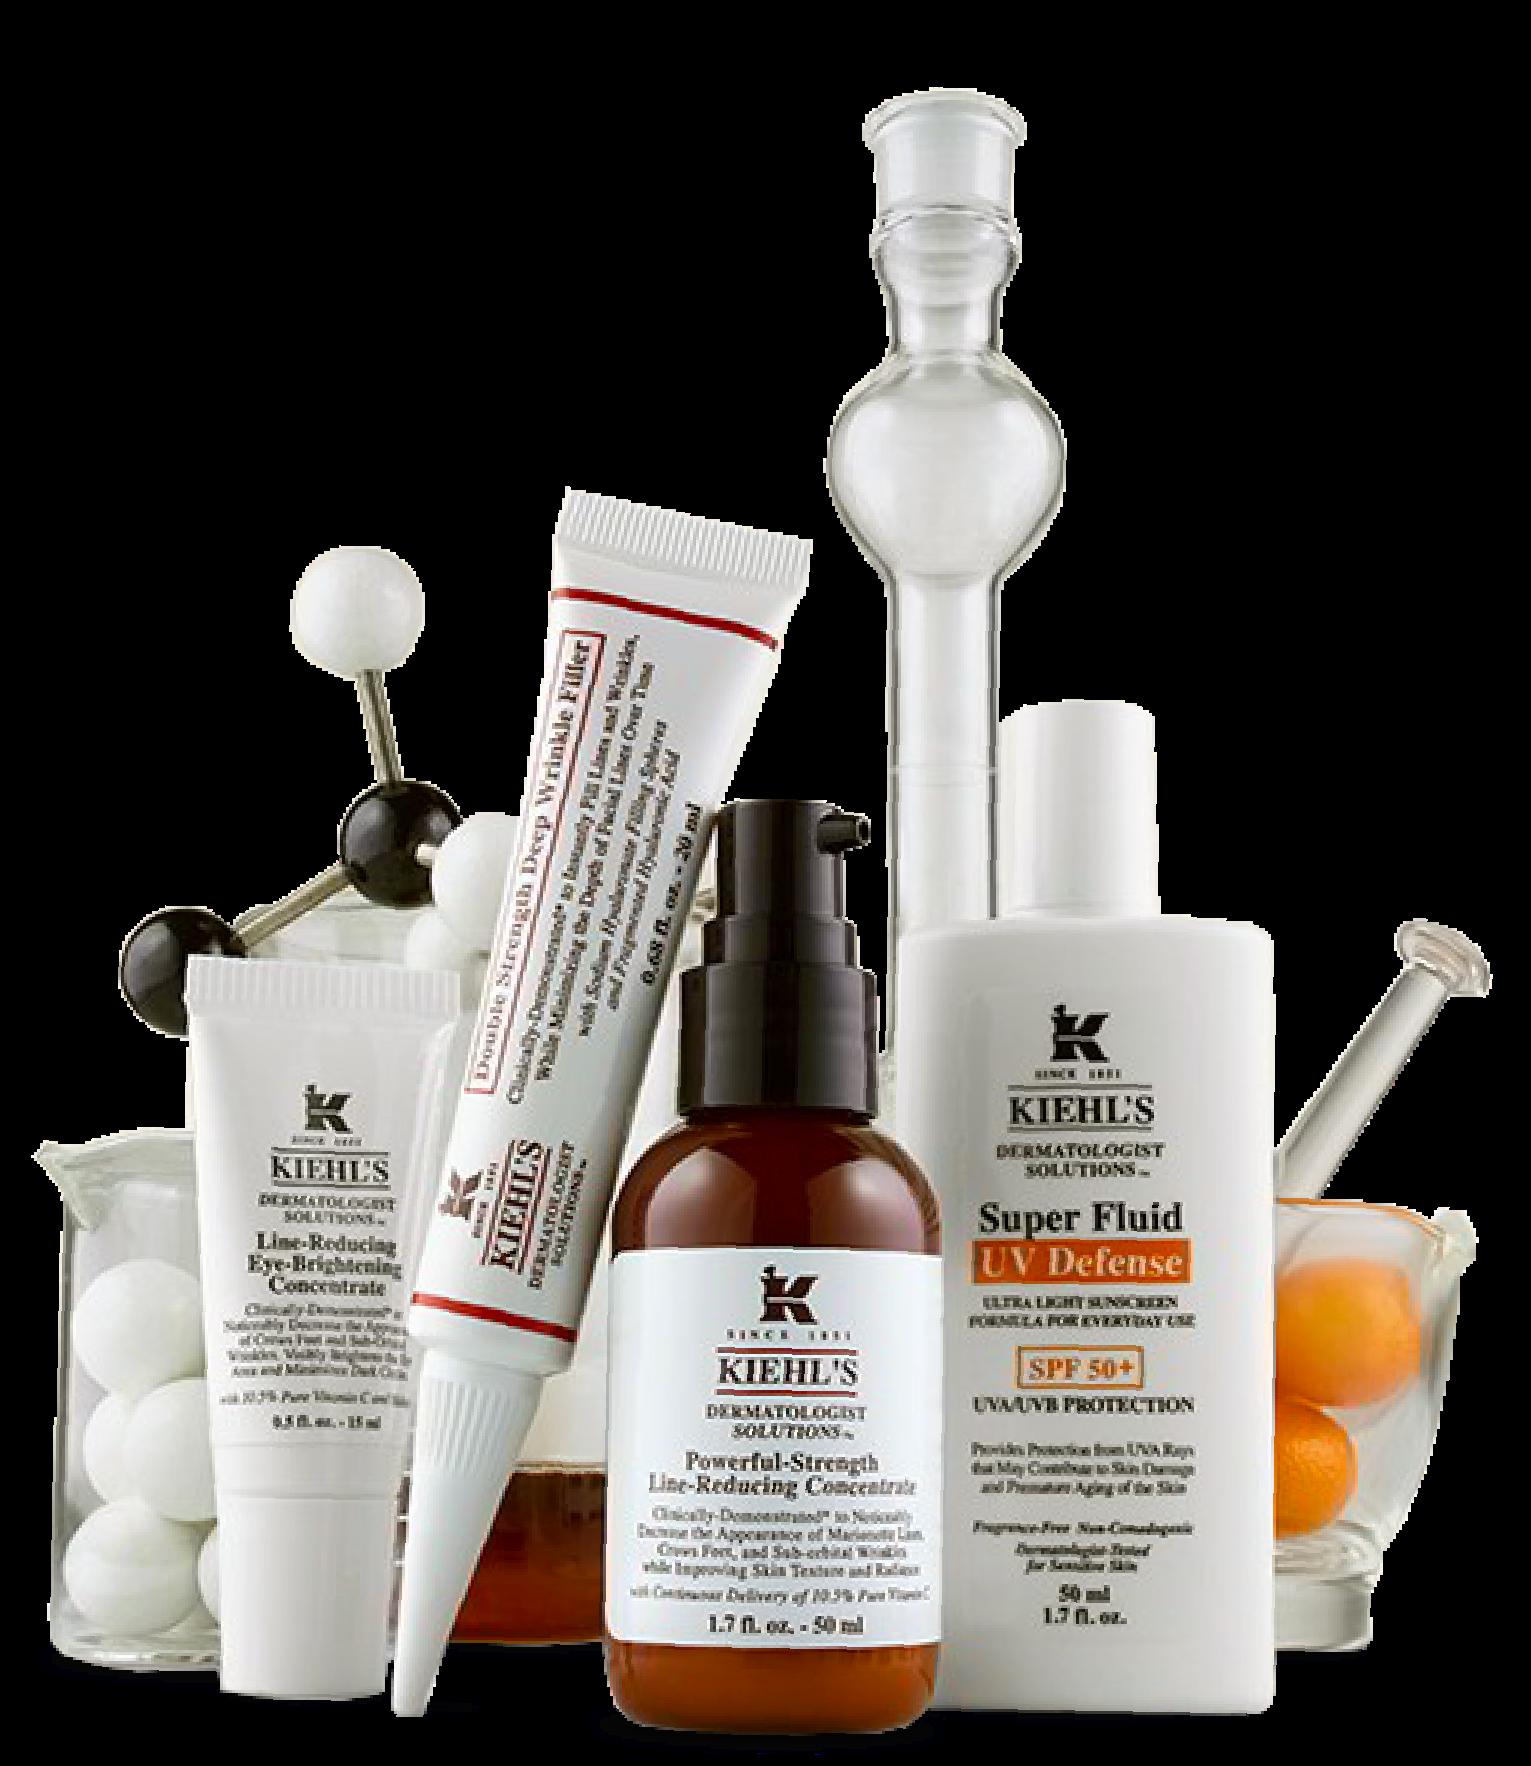 Kiehl's Quality Skincare